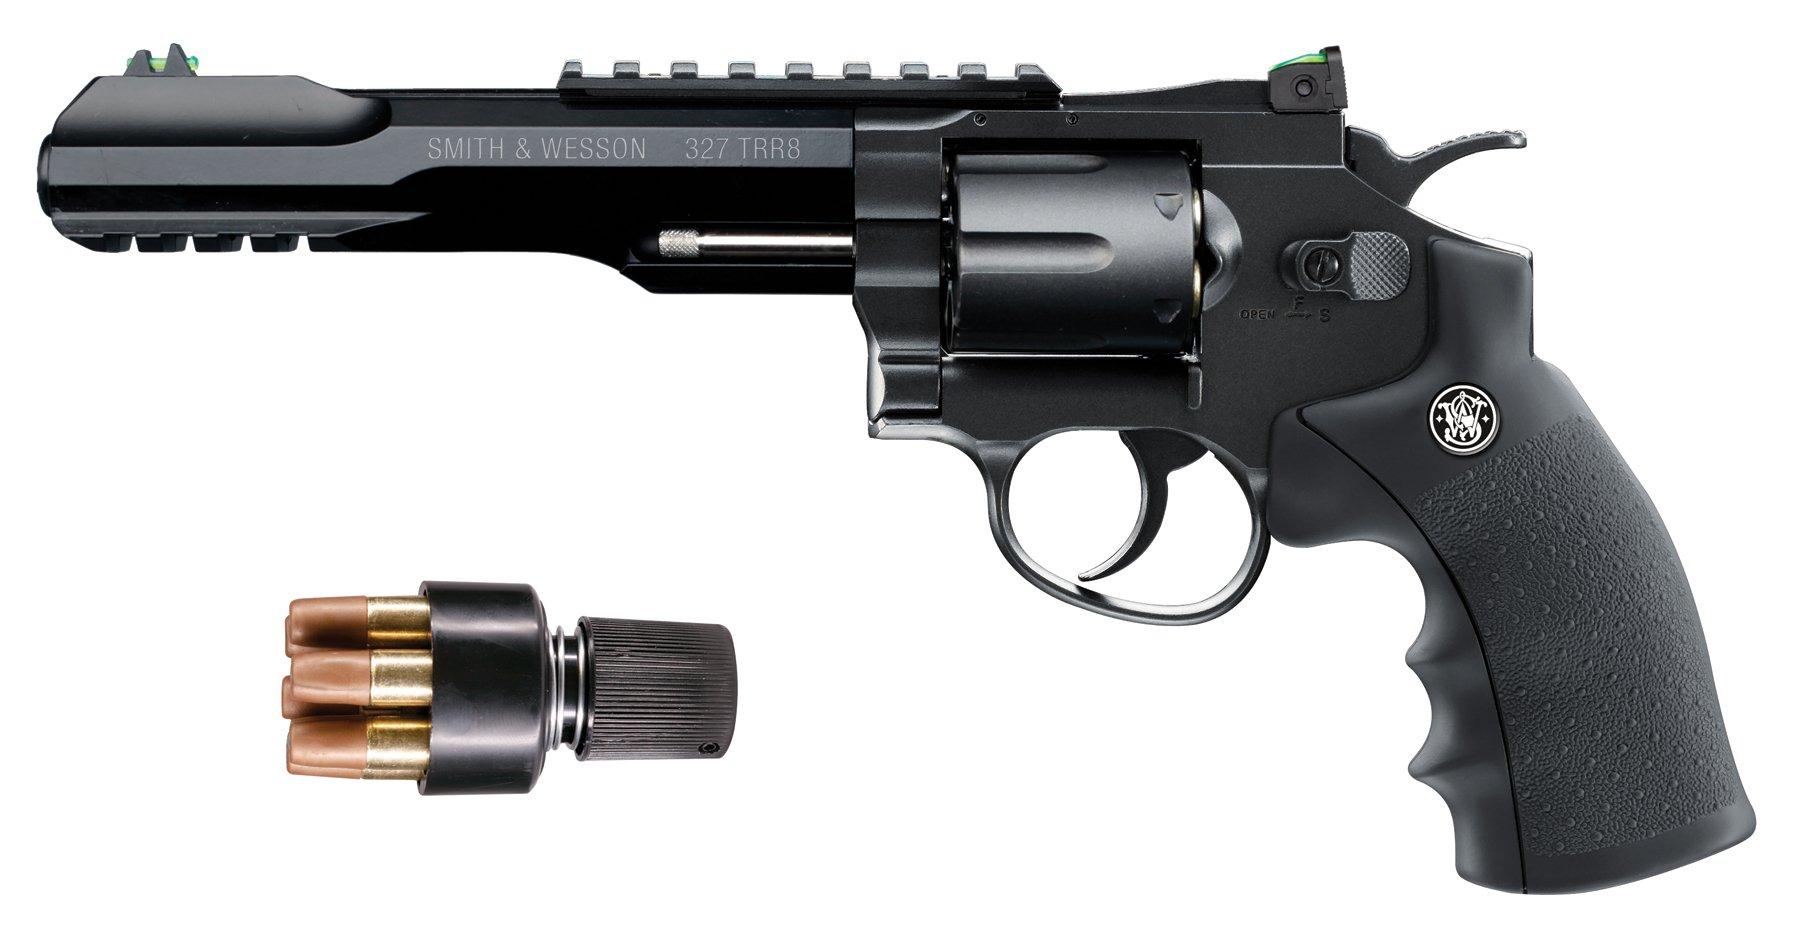 amazoncom smith wesson 327 trr8 177 caliber steel bb co2